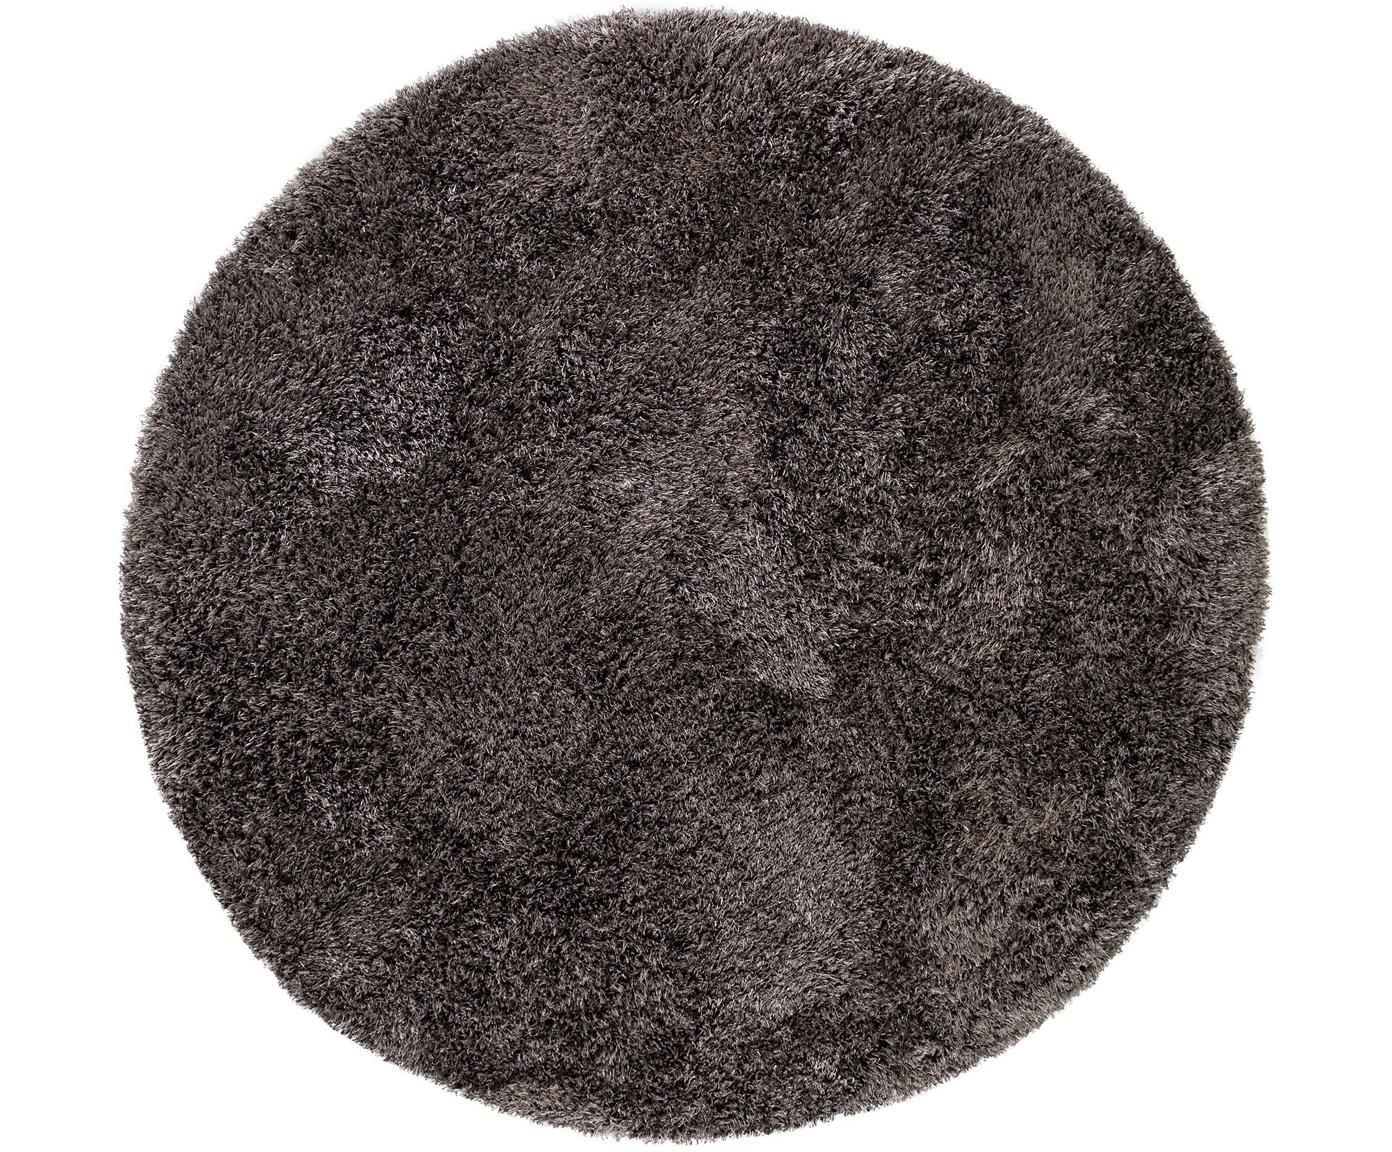 Alfombra redonda de pelo largo Lea, 50%poliéster, 50%polipropileno, Gris antracita, Ø 120 cm (Tamaño S)